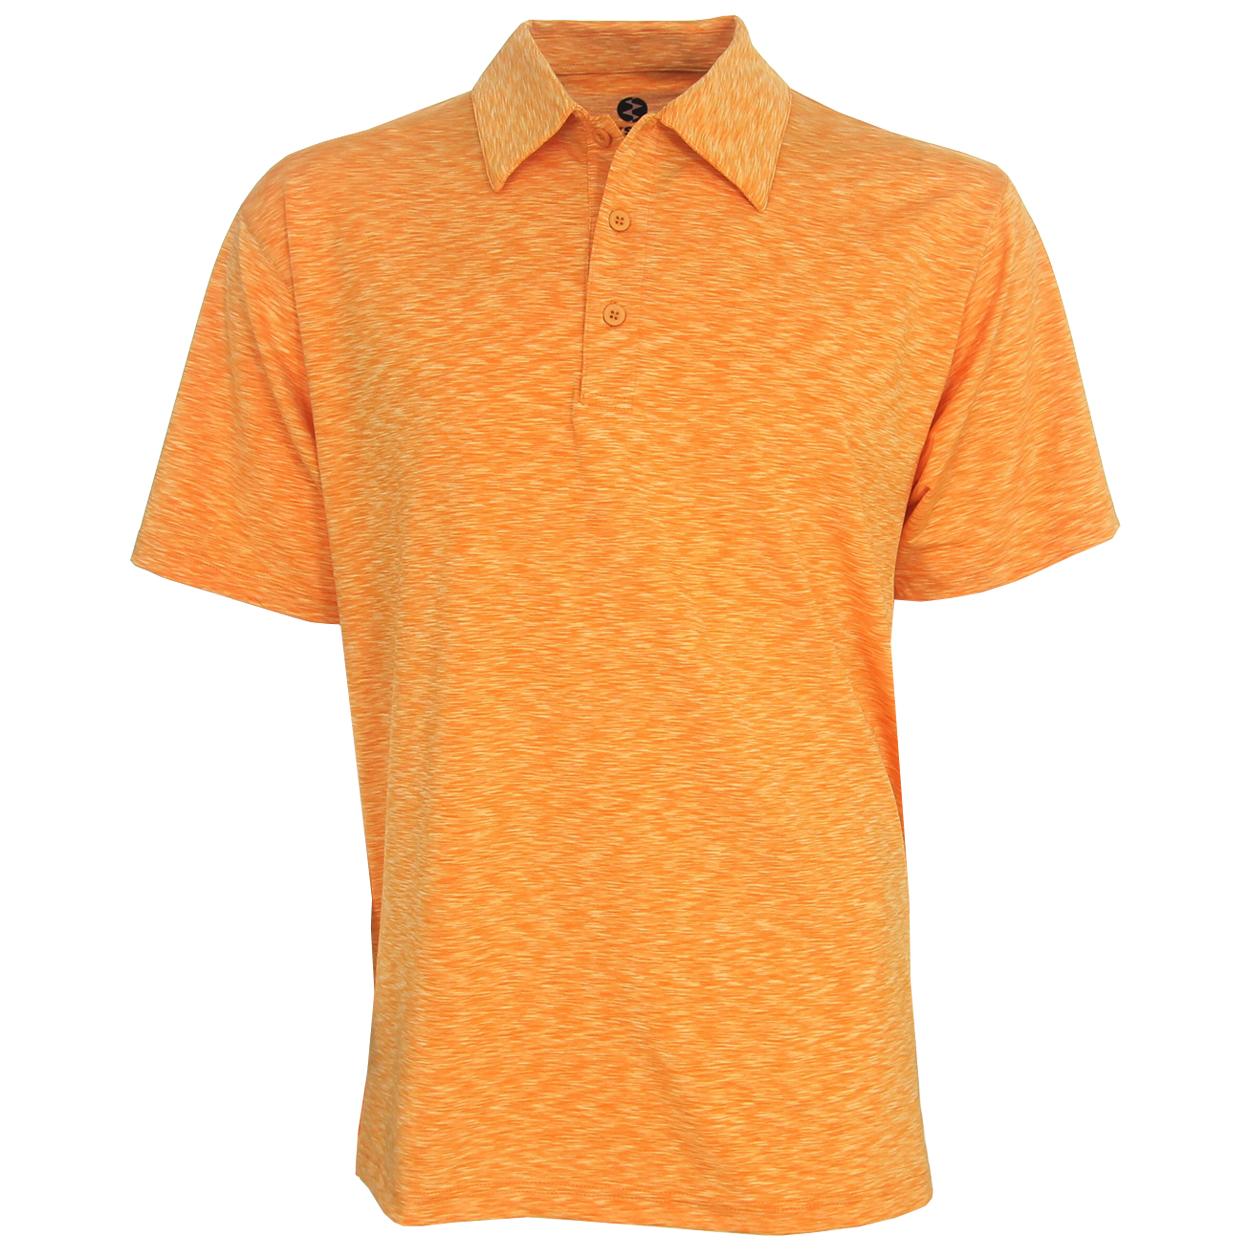 Ixspa space dye polo golf shirt for Name brand golf shirts